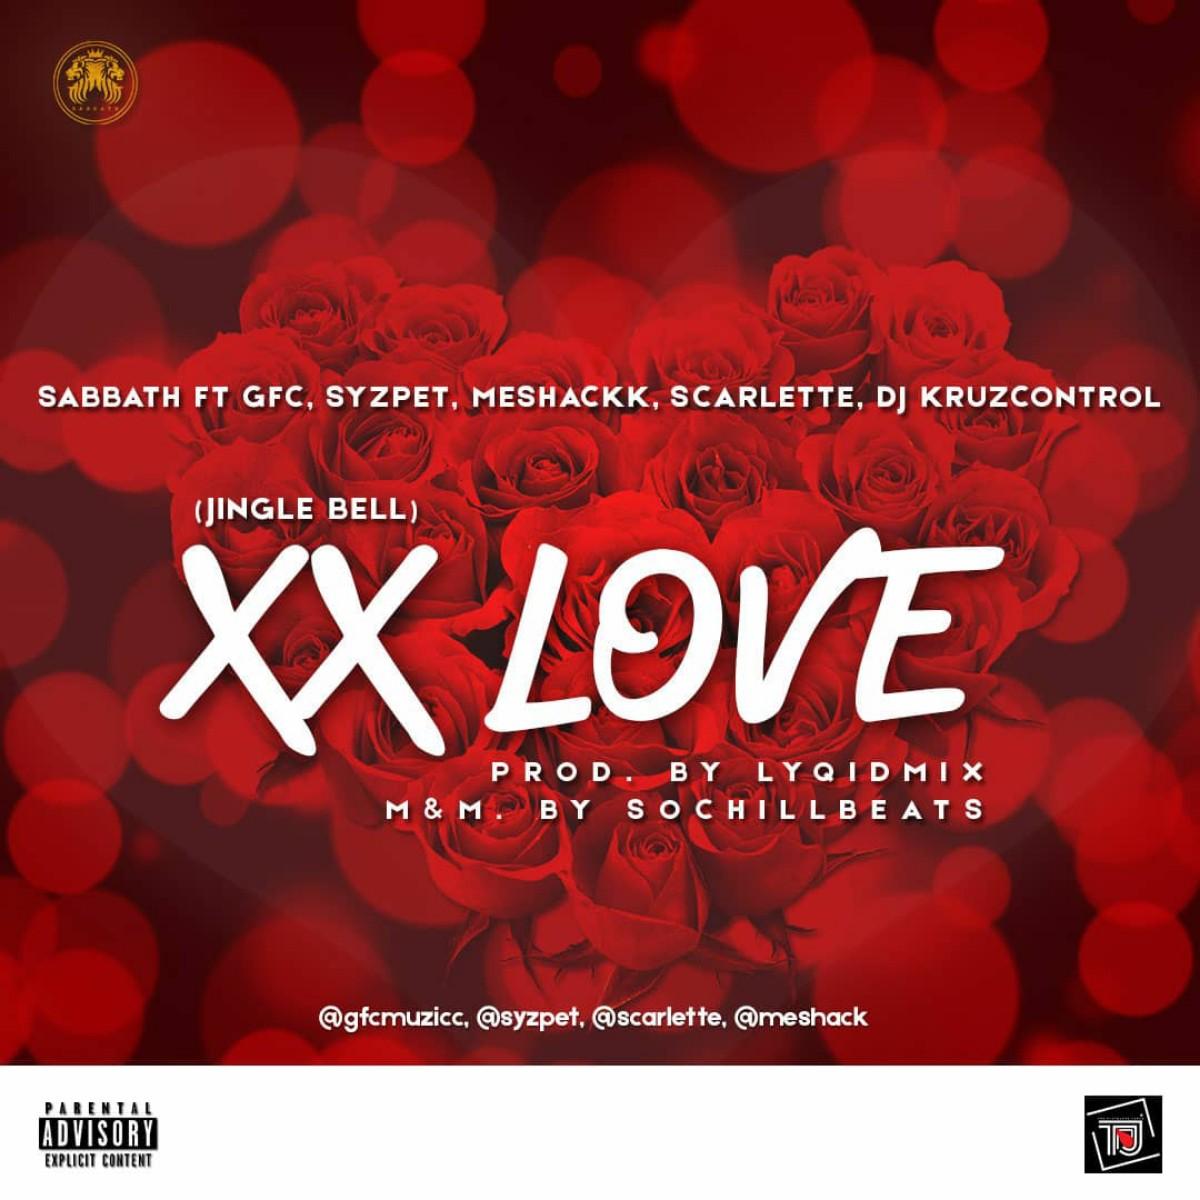 (MUSIC/AUDIO): Sabbath ft. GFC × Syzpet × Meshackk × Scarlette × Dj Kruzcontrol – XX Love